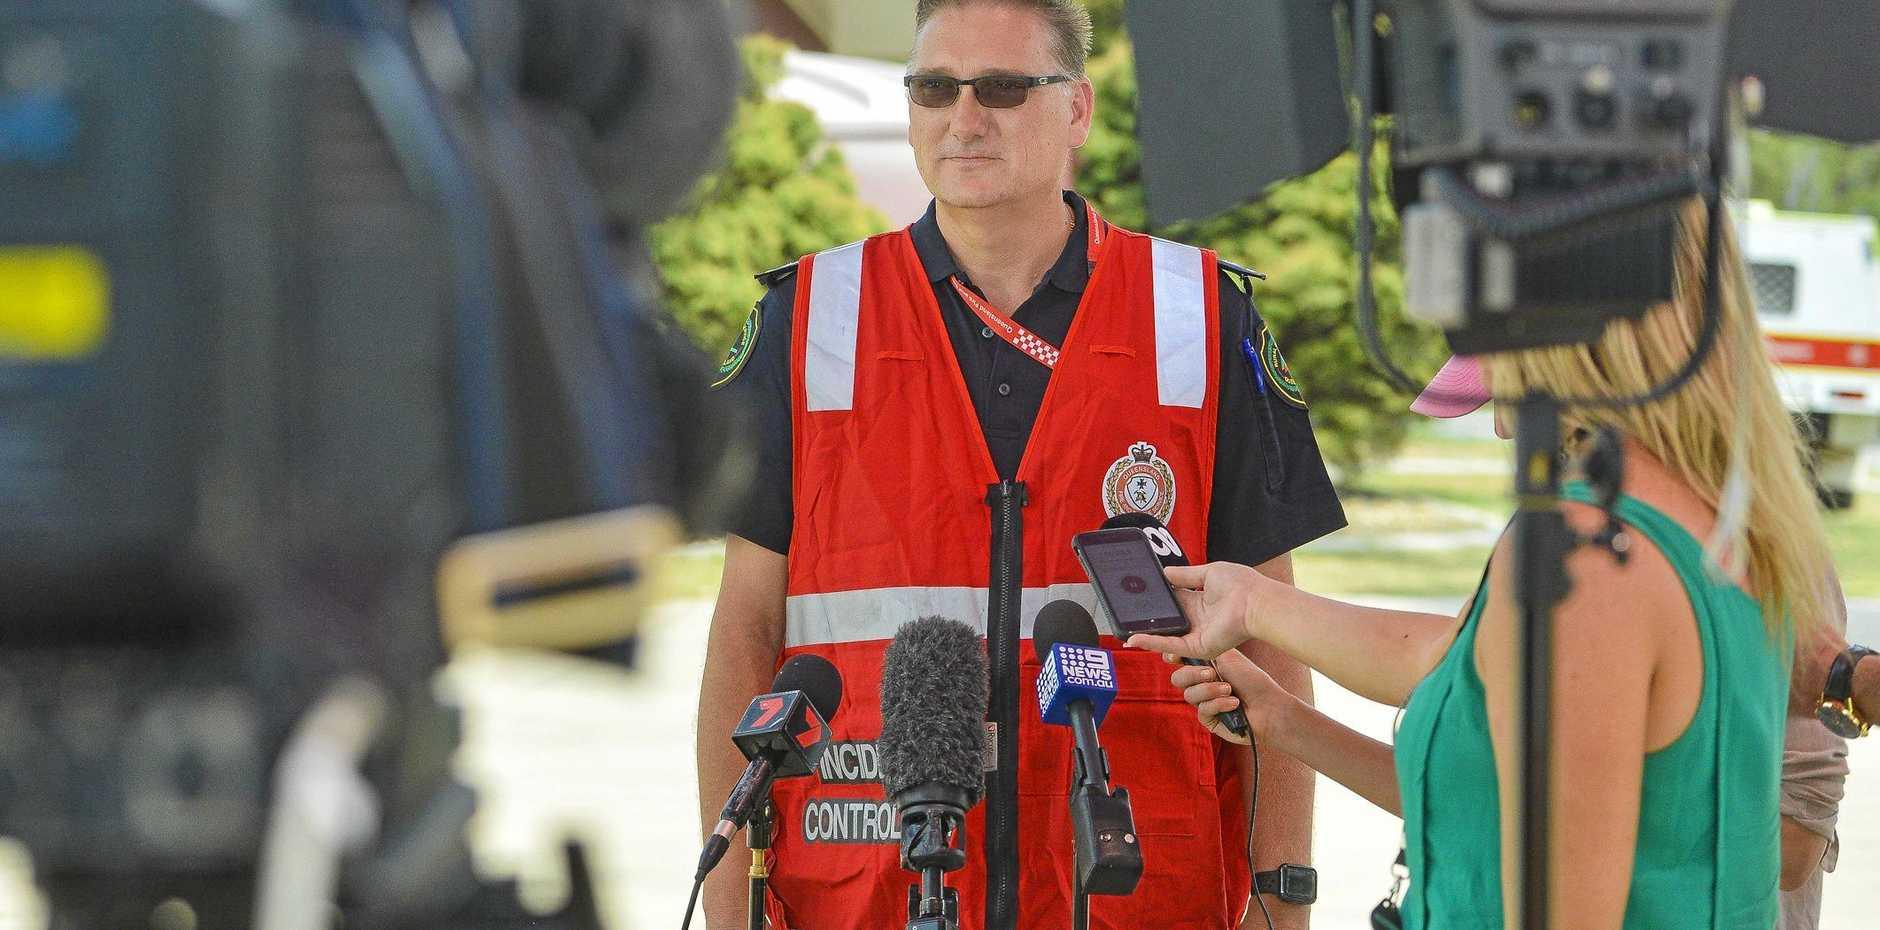 Area director Craig Magick addresses the media regarding the Deepwater bushfire